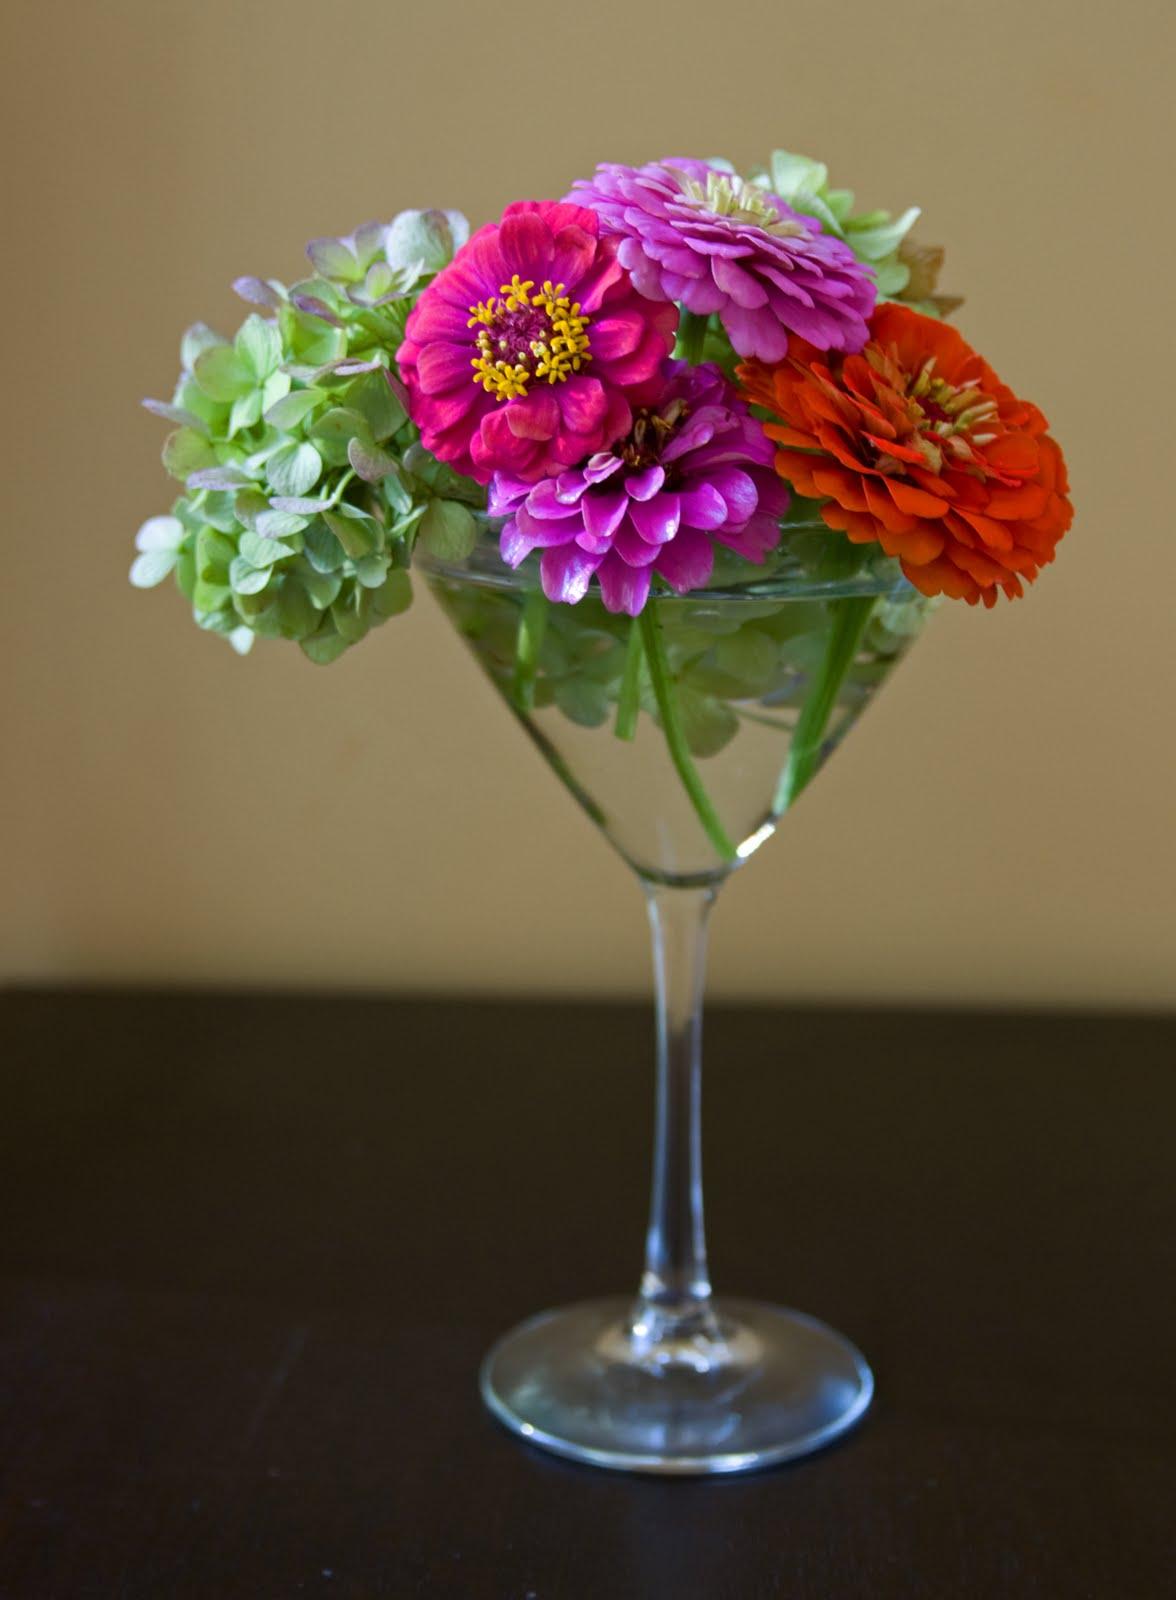 Life in Wonderland: No Vase? No Problem!